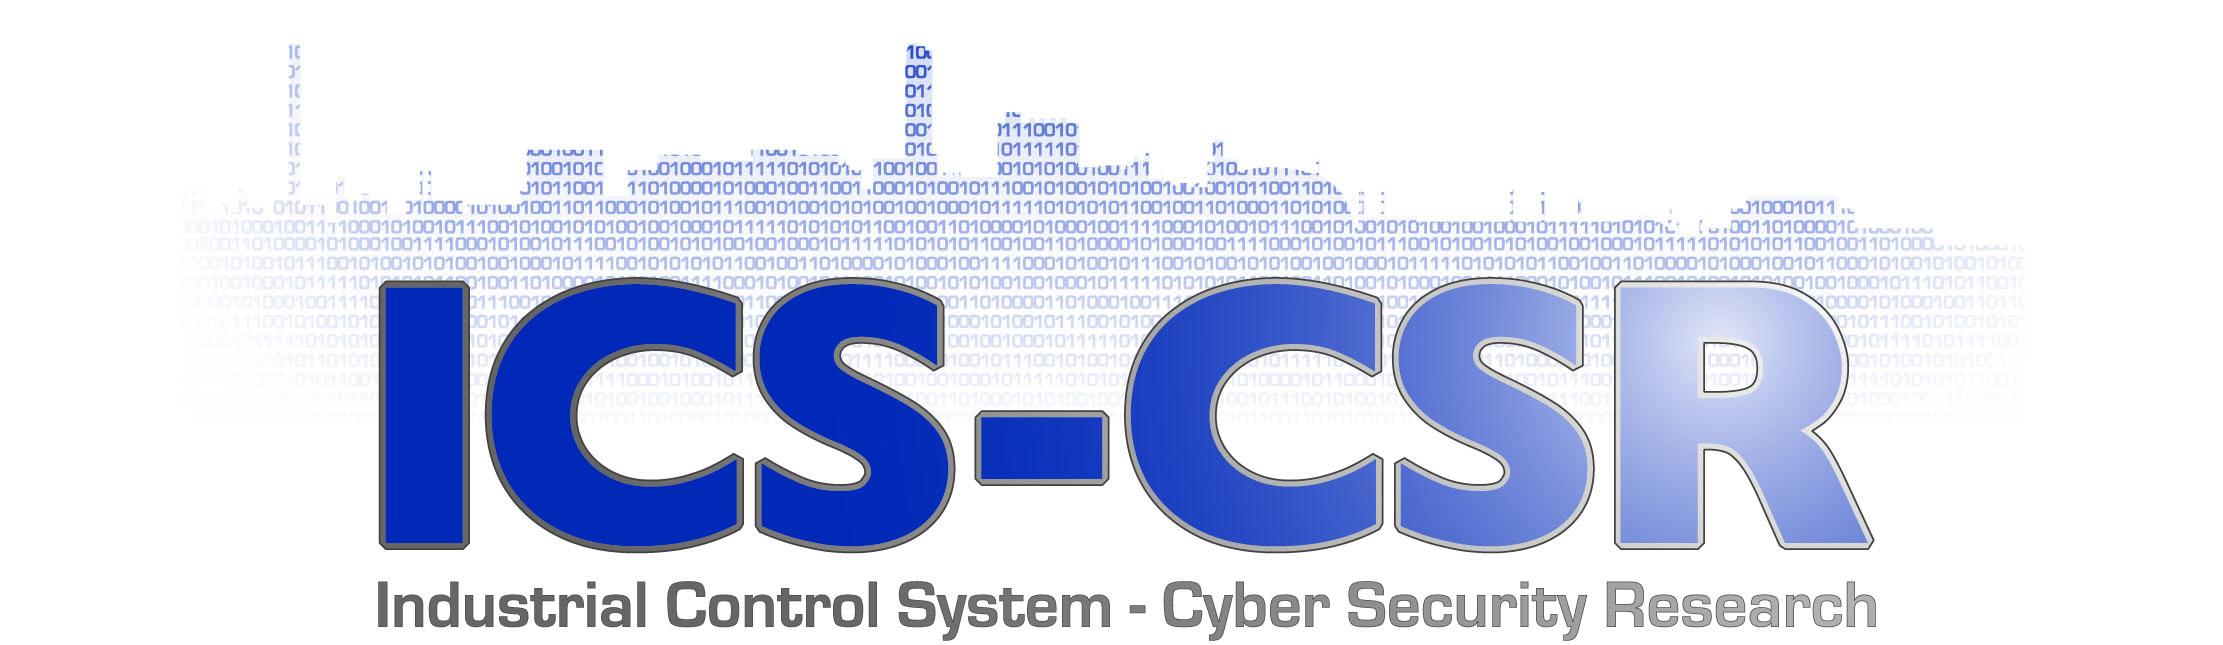 ICS-CSR 2020 (7th International Symposium for ICS & SCADA Cyber Security)